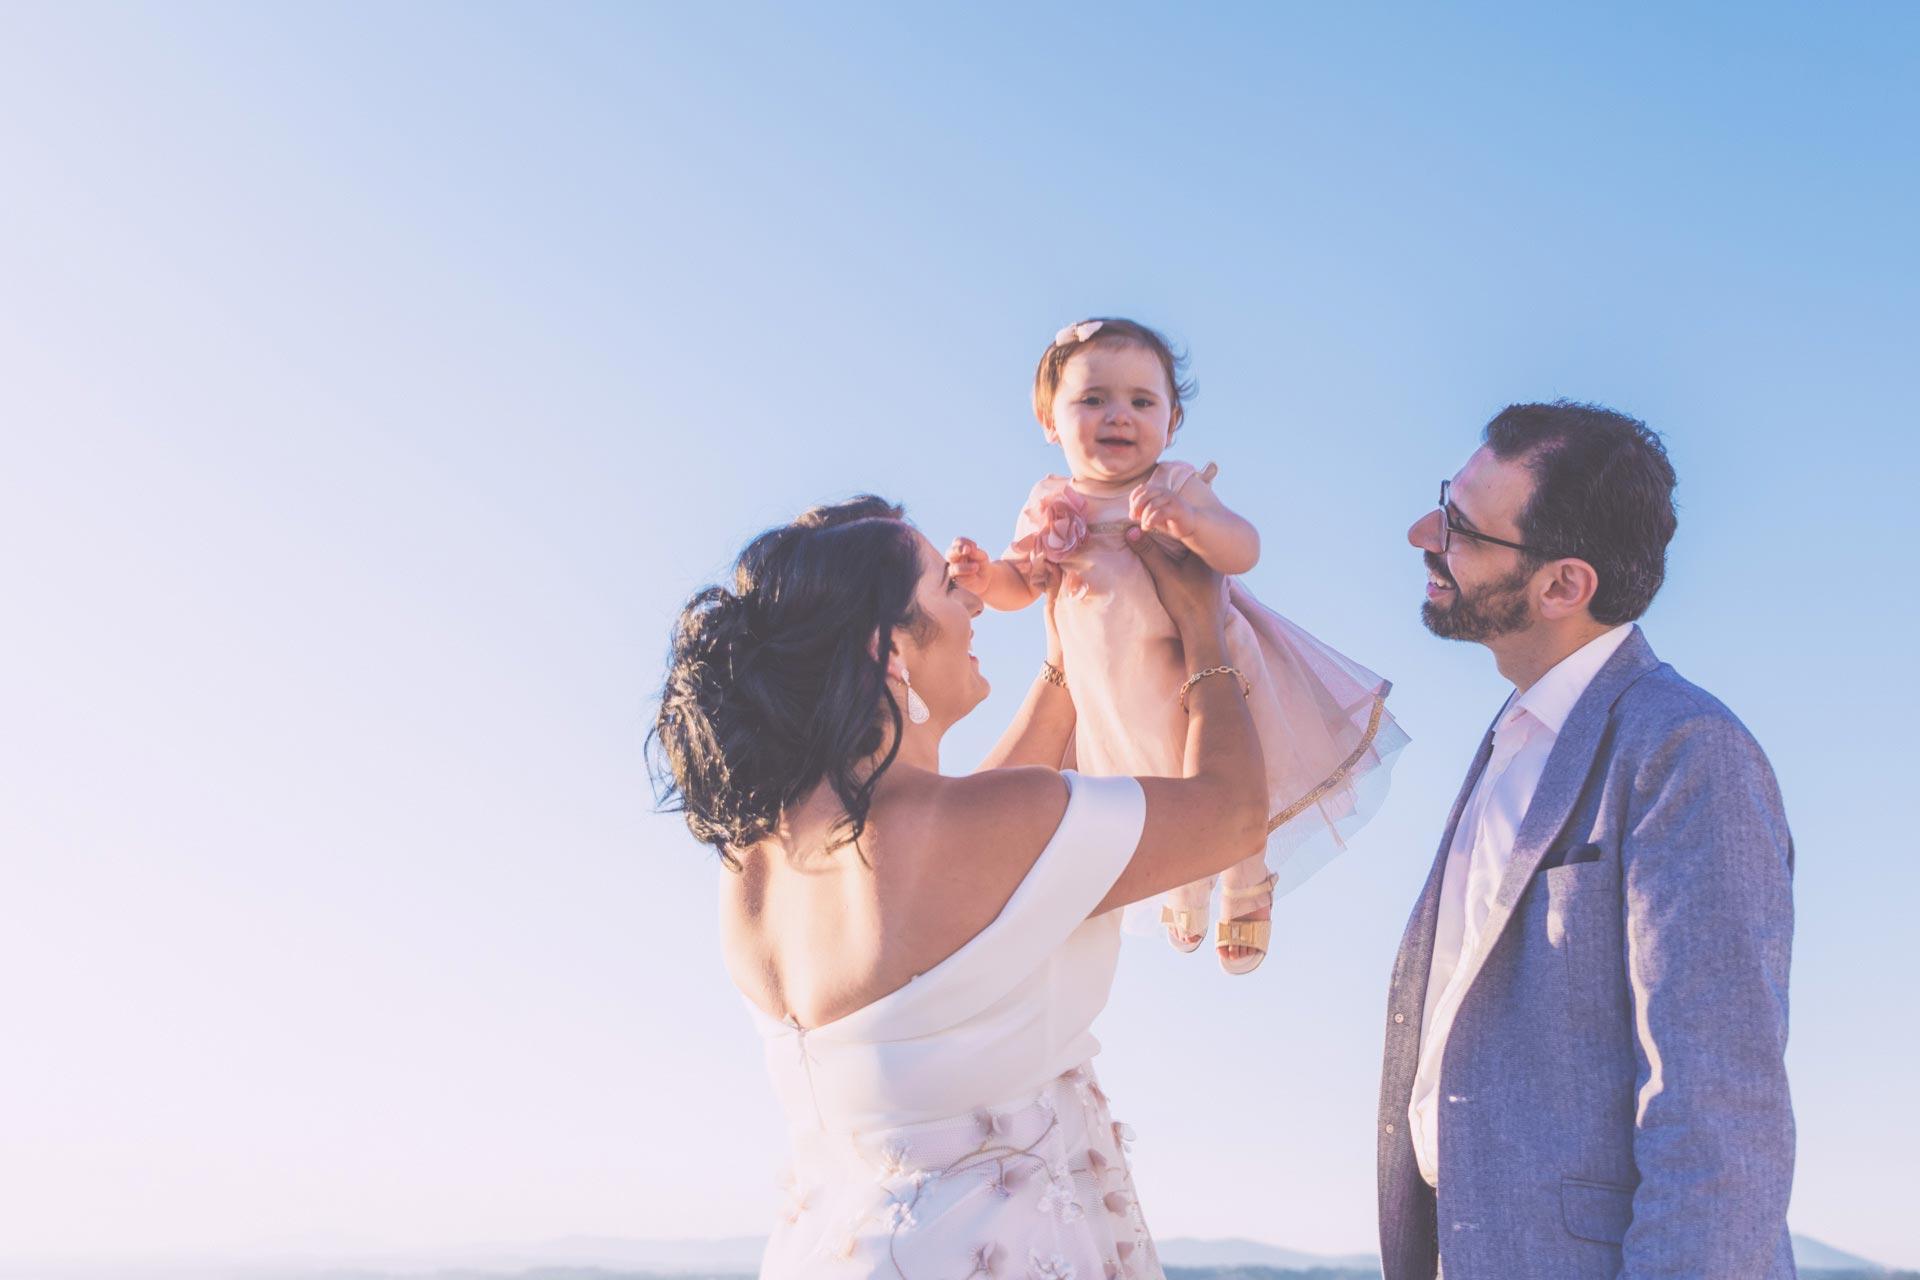 079 PhotoVaptisis Spetses vaptisi βαπτιση μωρο βαπτιστικά βαπριση σπετσες αγιος μαμας διακοσμηση βάπτισης γονείς νονά